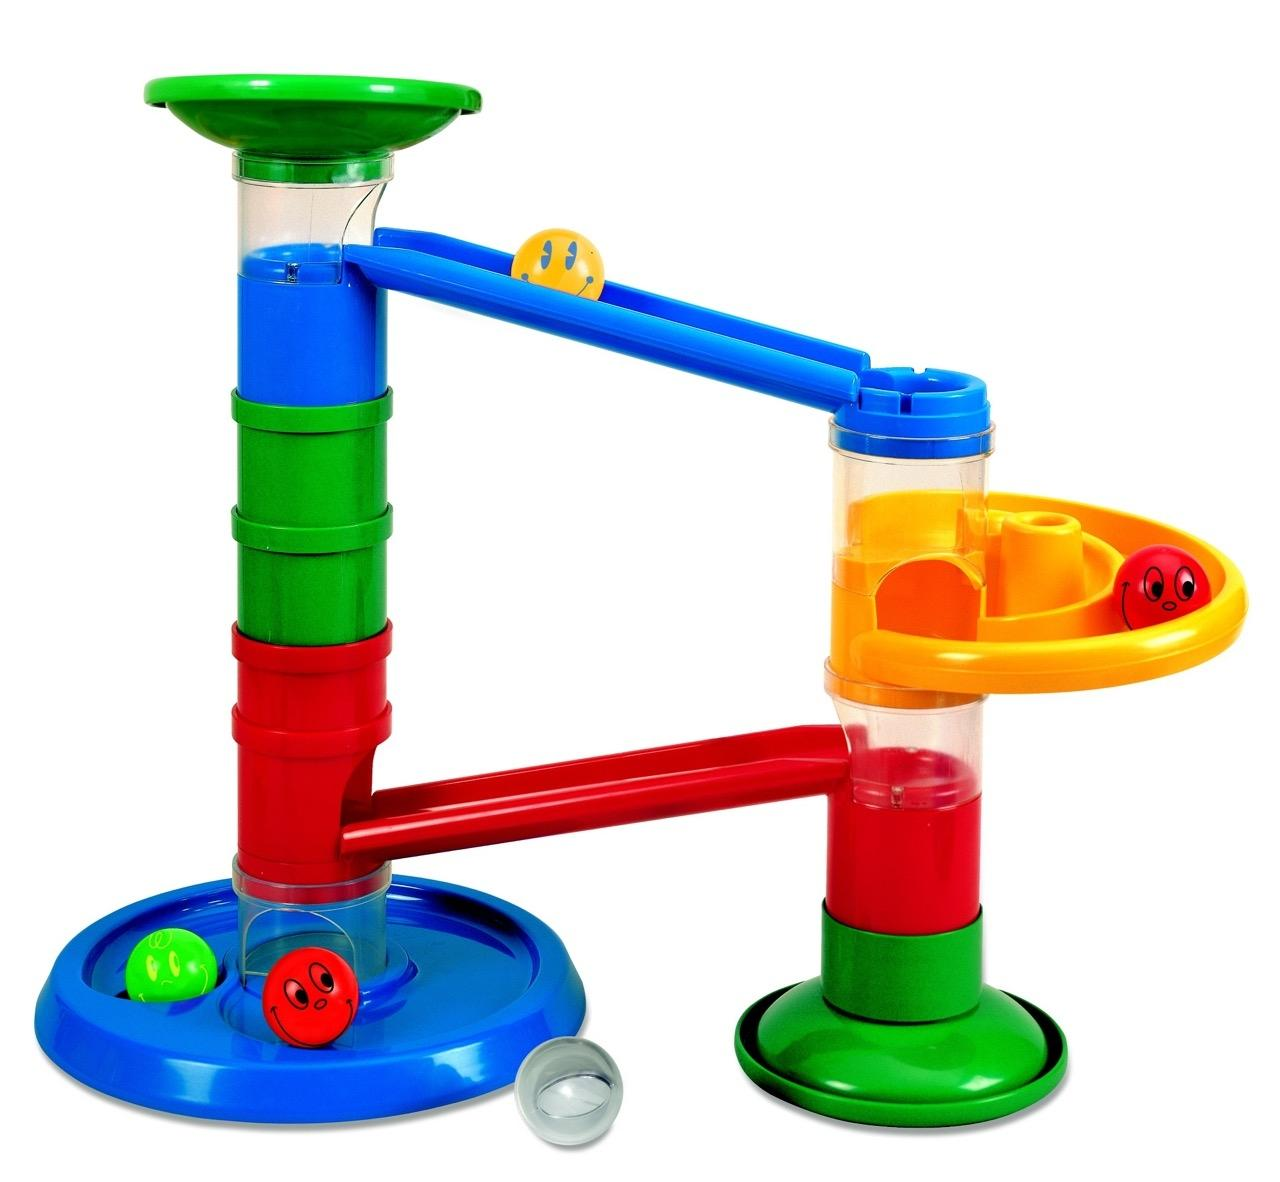 Toys For Balls : Amazon edushape rollipop advanced ball drop set